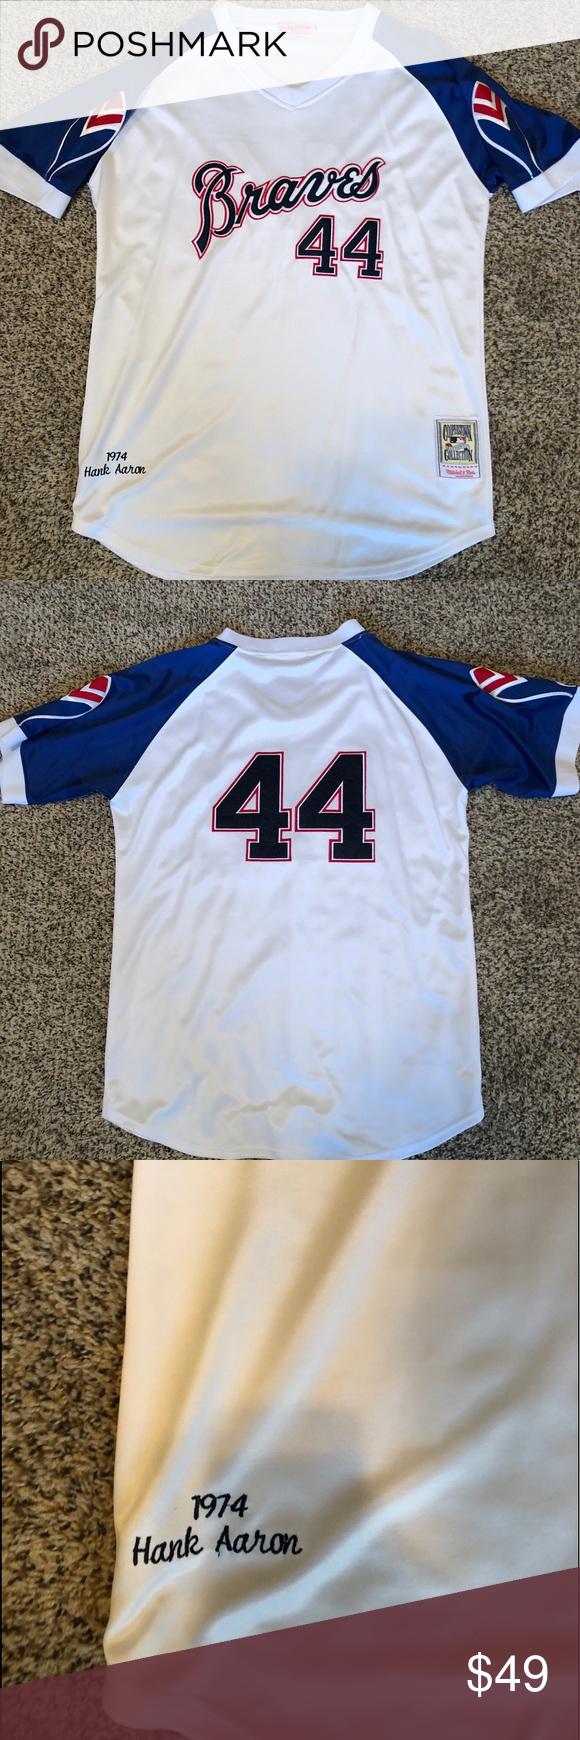 Vintage Atlanta Braves Hank Aaron Jersey Throwback Hank Aaron Jersey Size 54 Never Been Worn Always On Display Perfec Atlanta Braves Braves Clothes Design